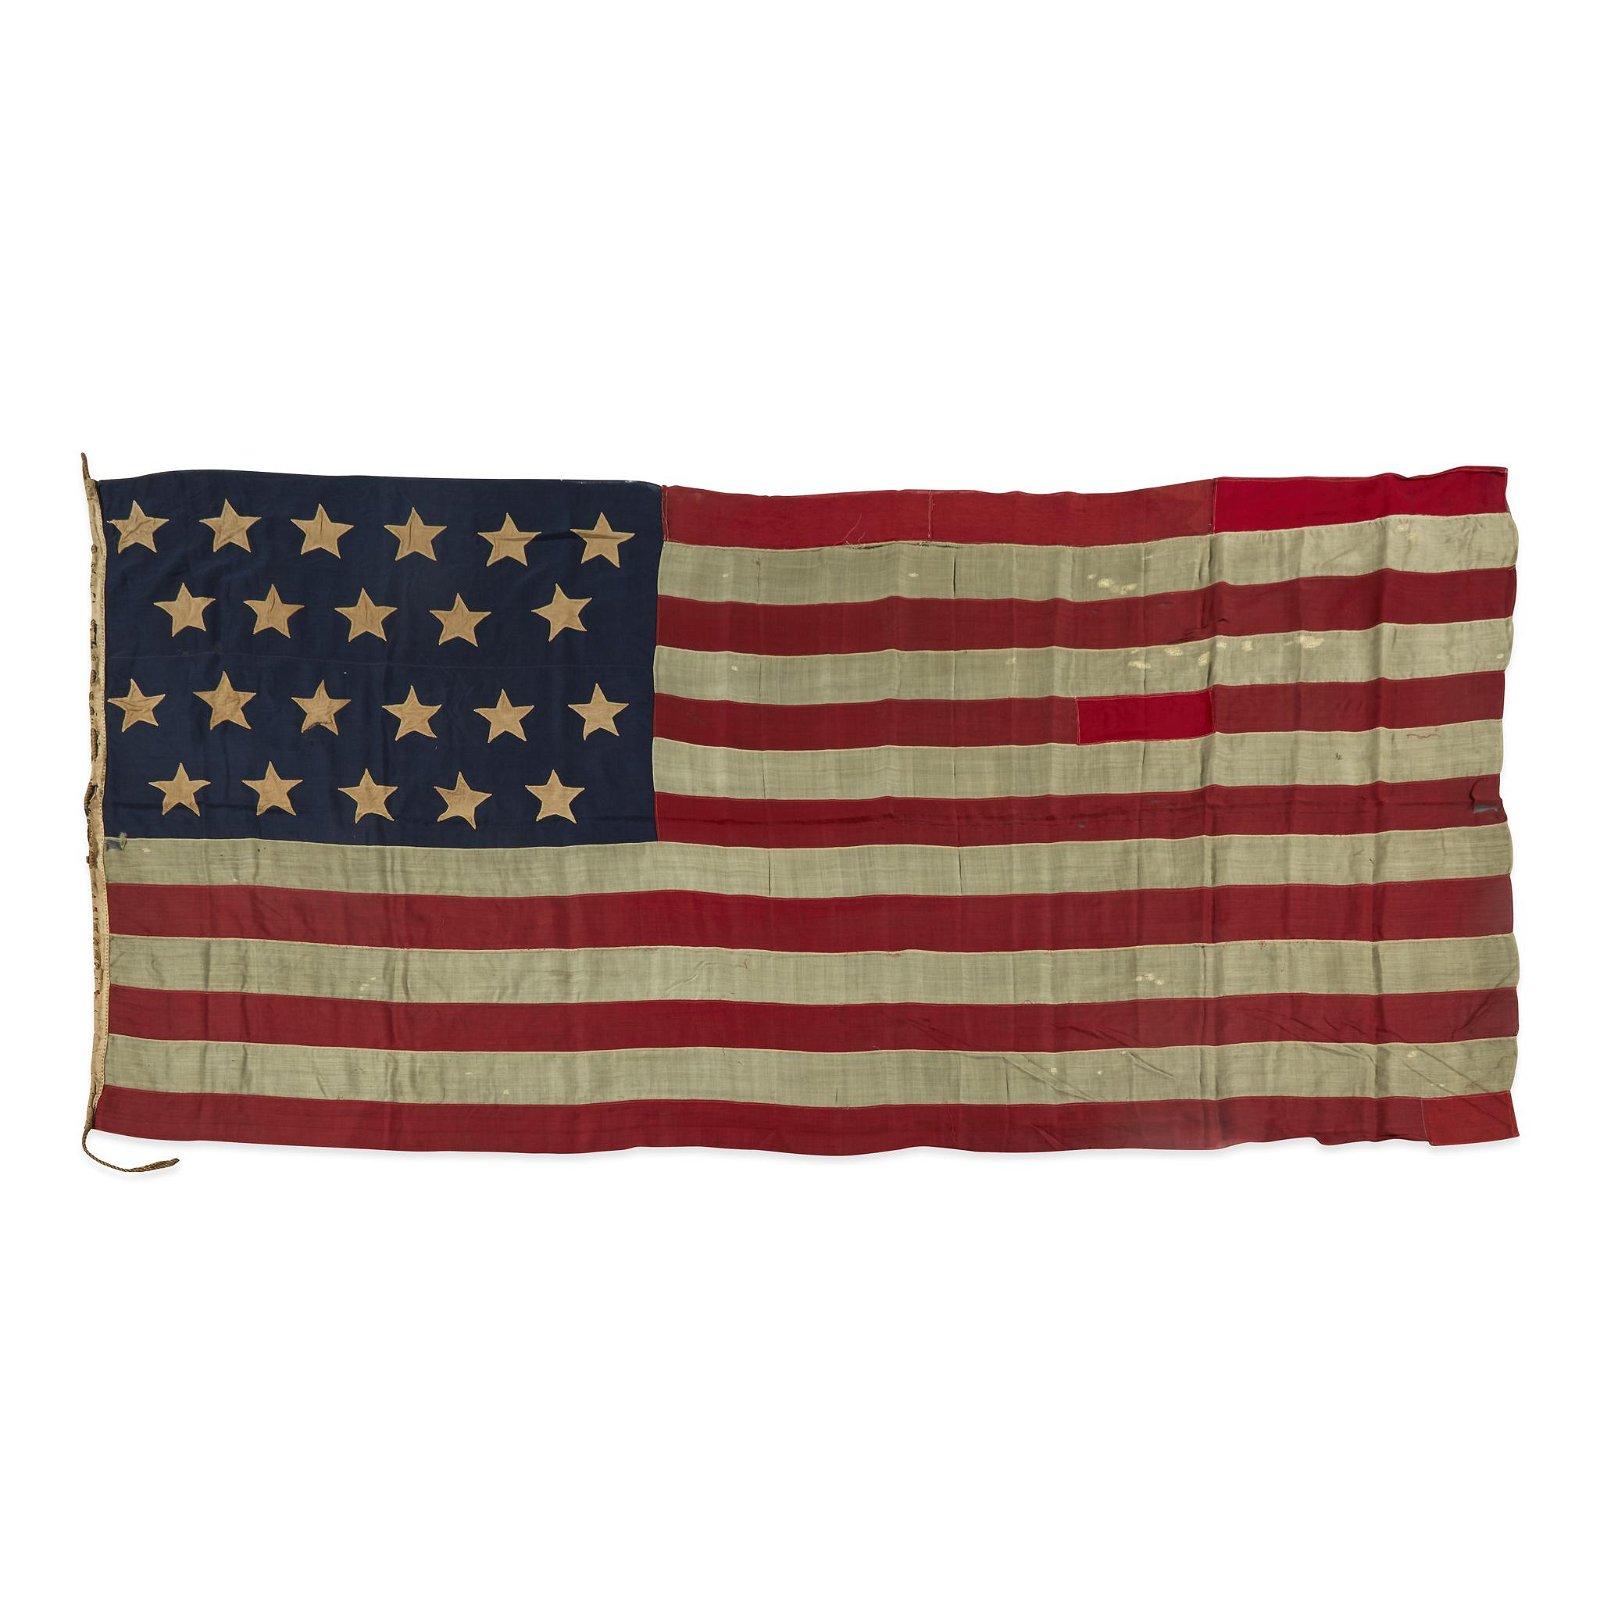 A 22-Star American Flag commemorating Alabama statehood